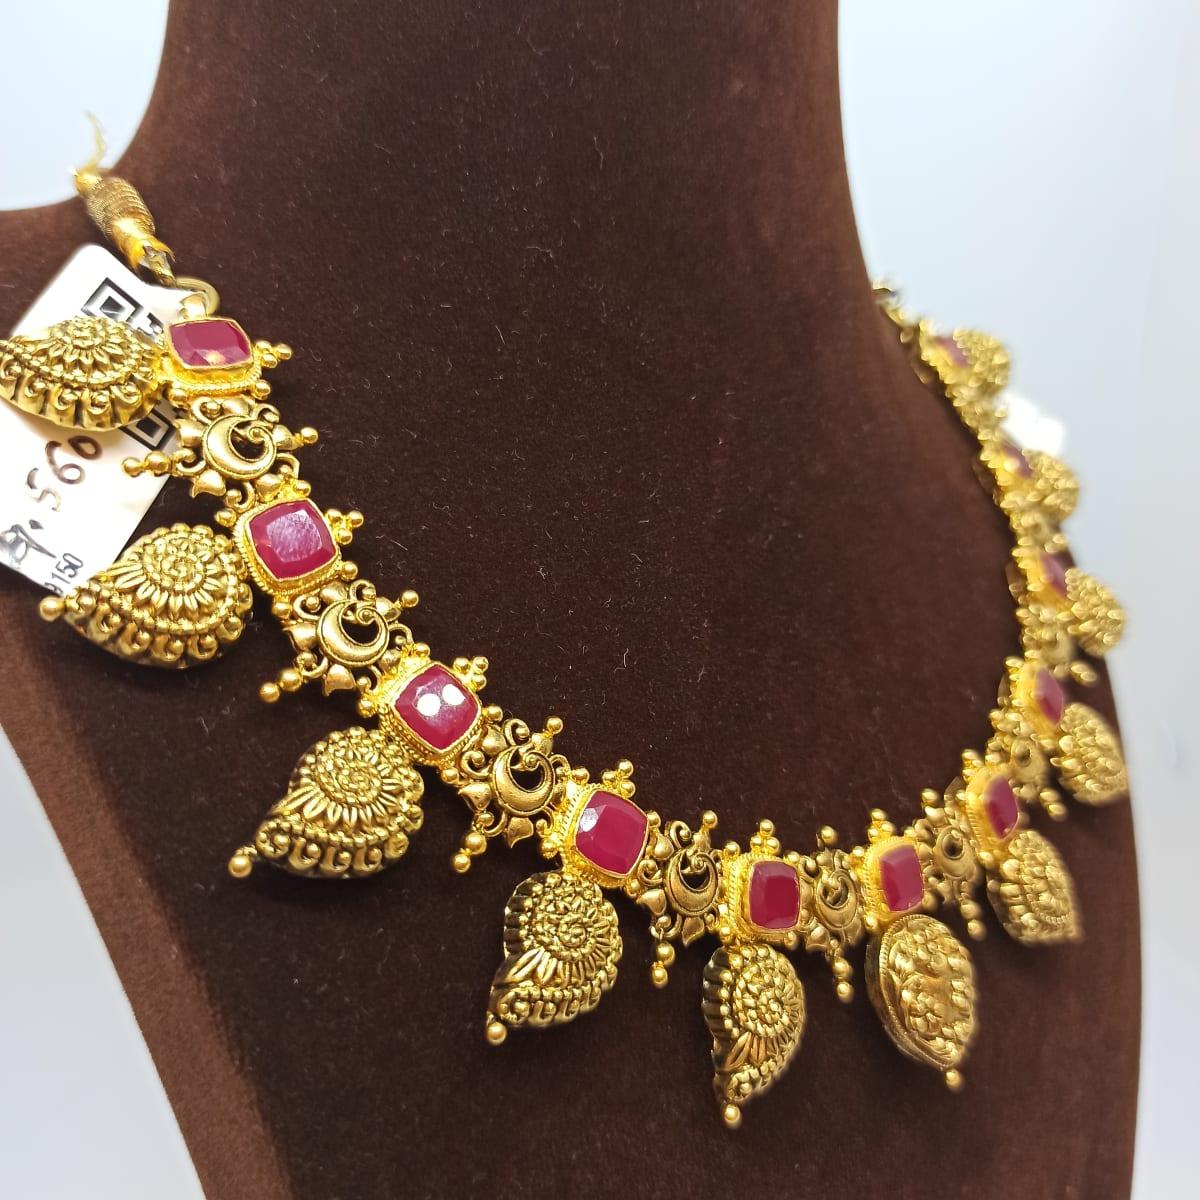 Antique Gemstone Necklace